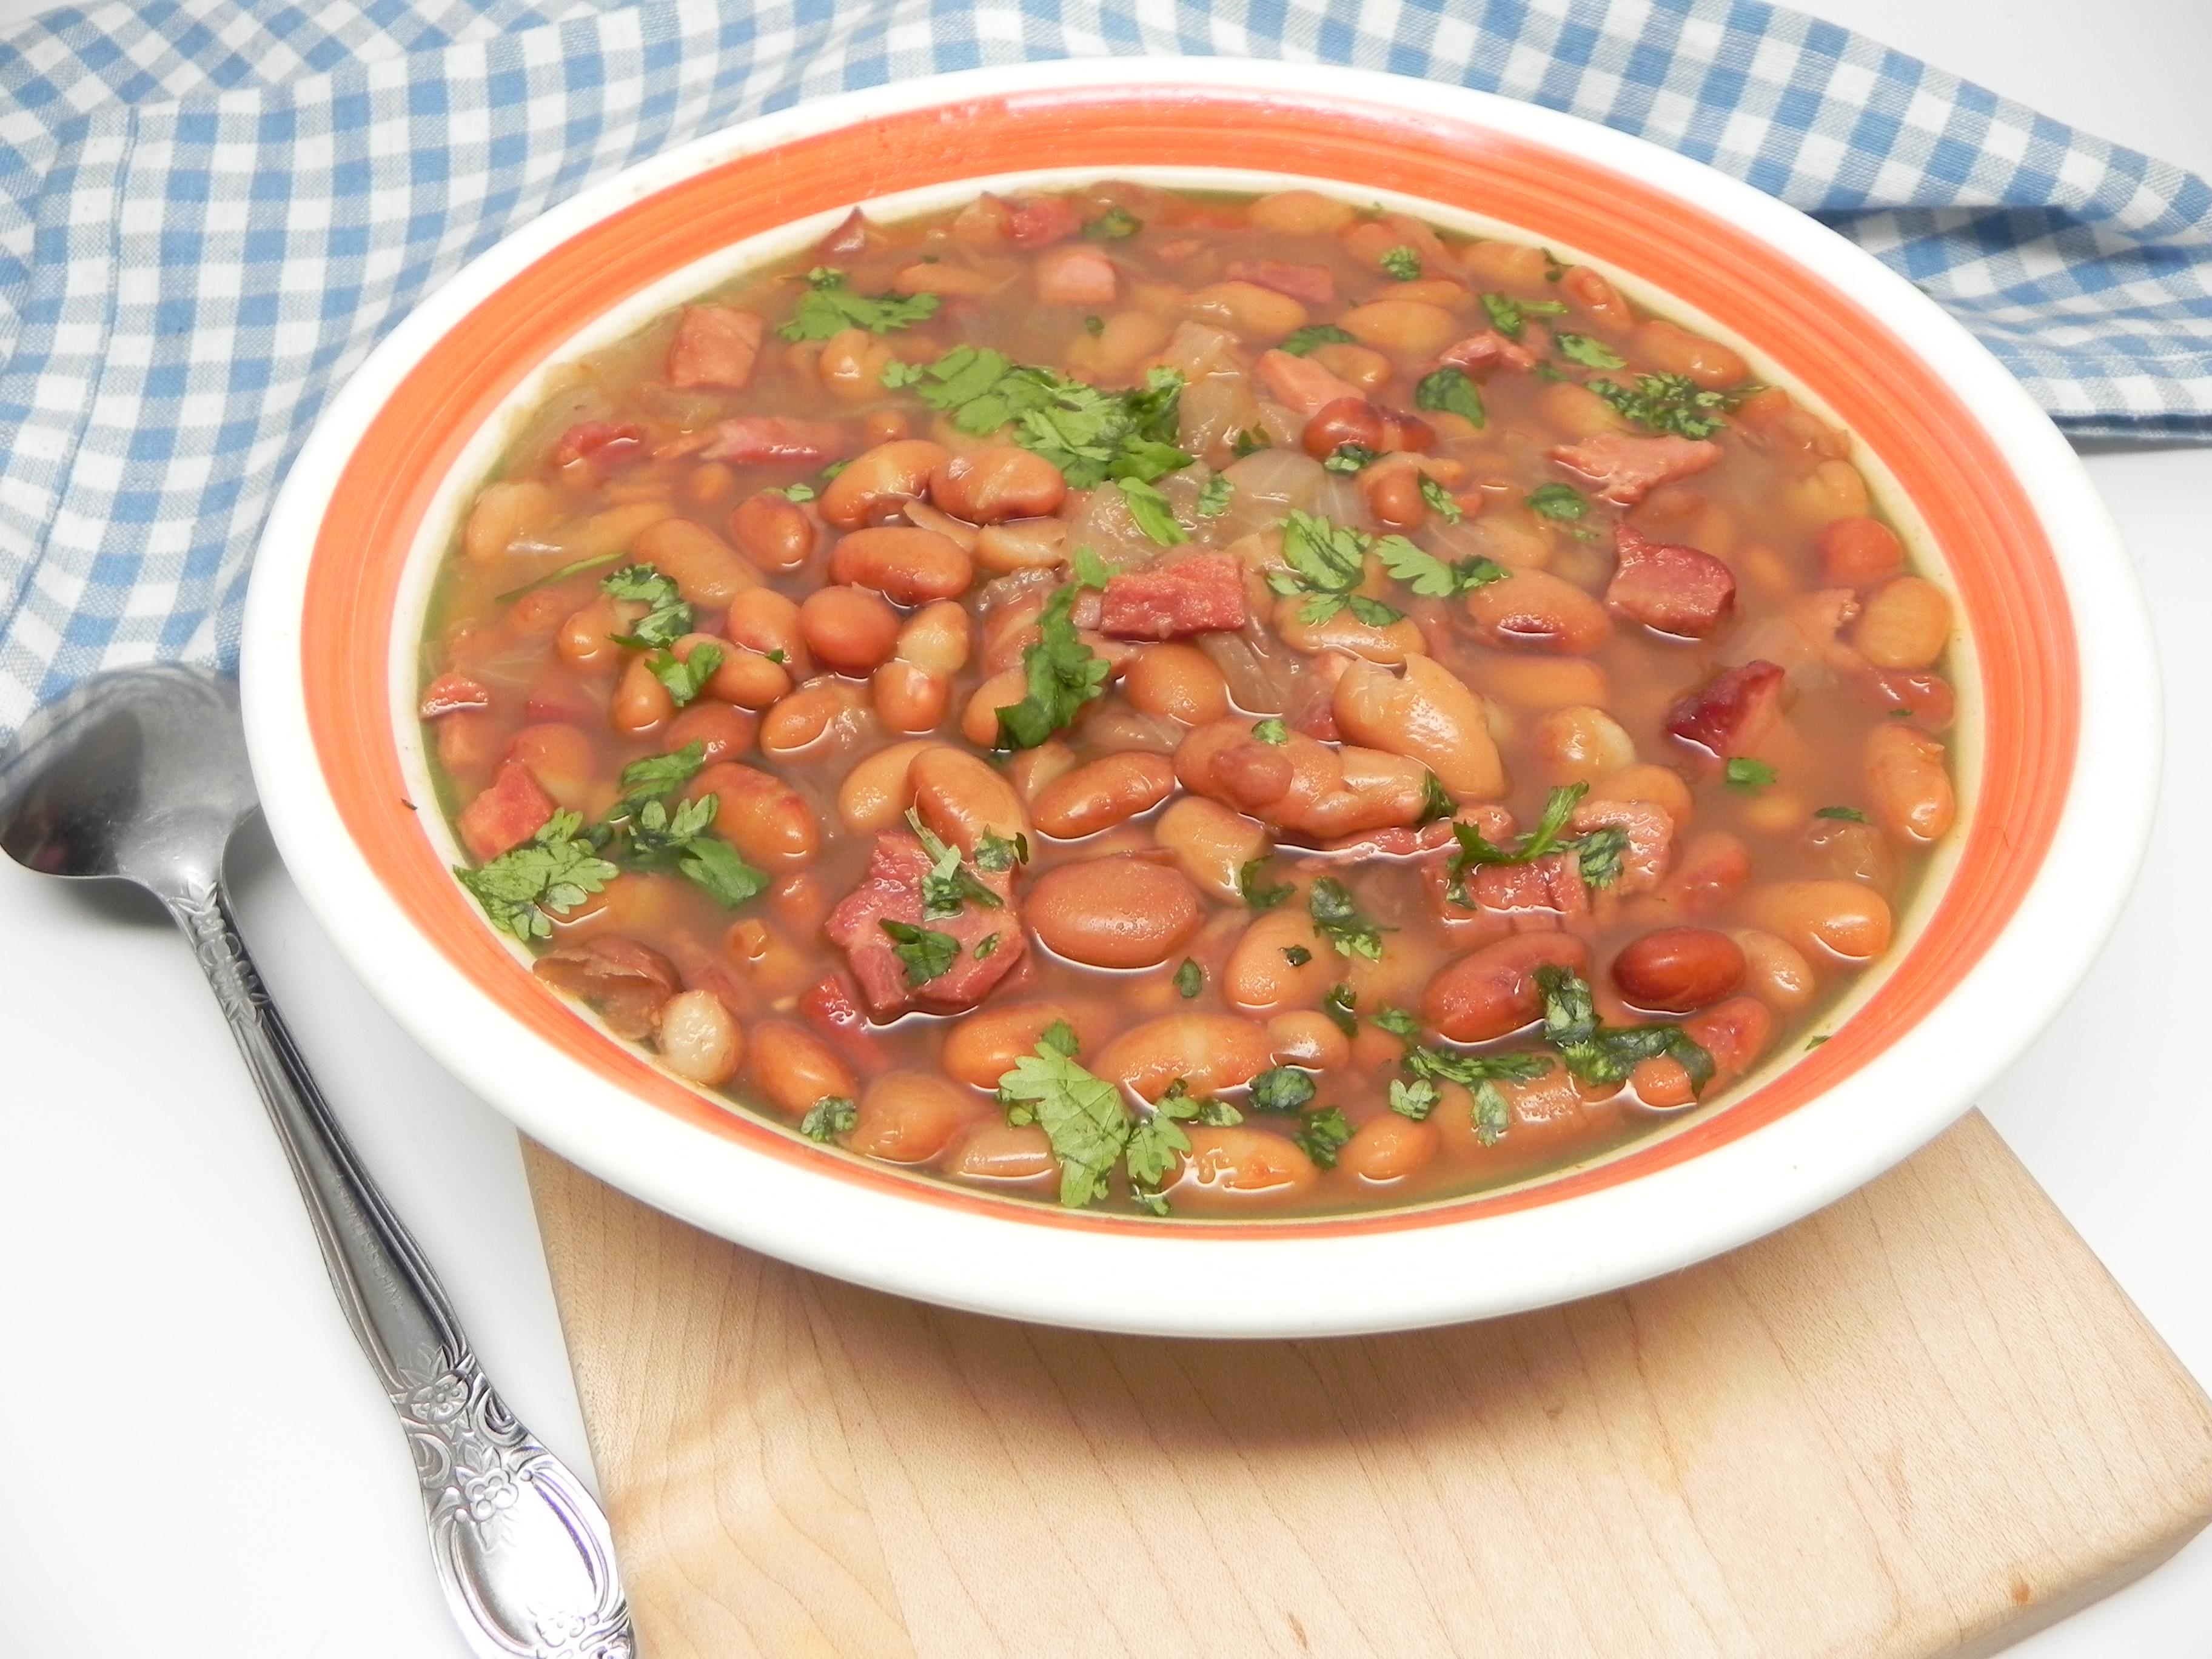 Homemade Pinto Beans